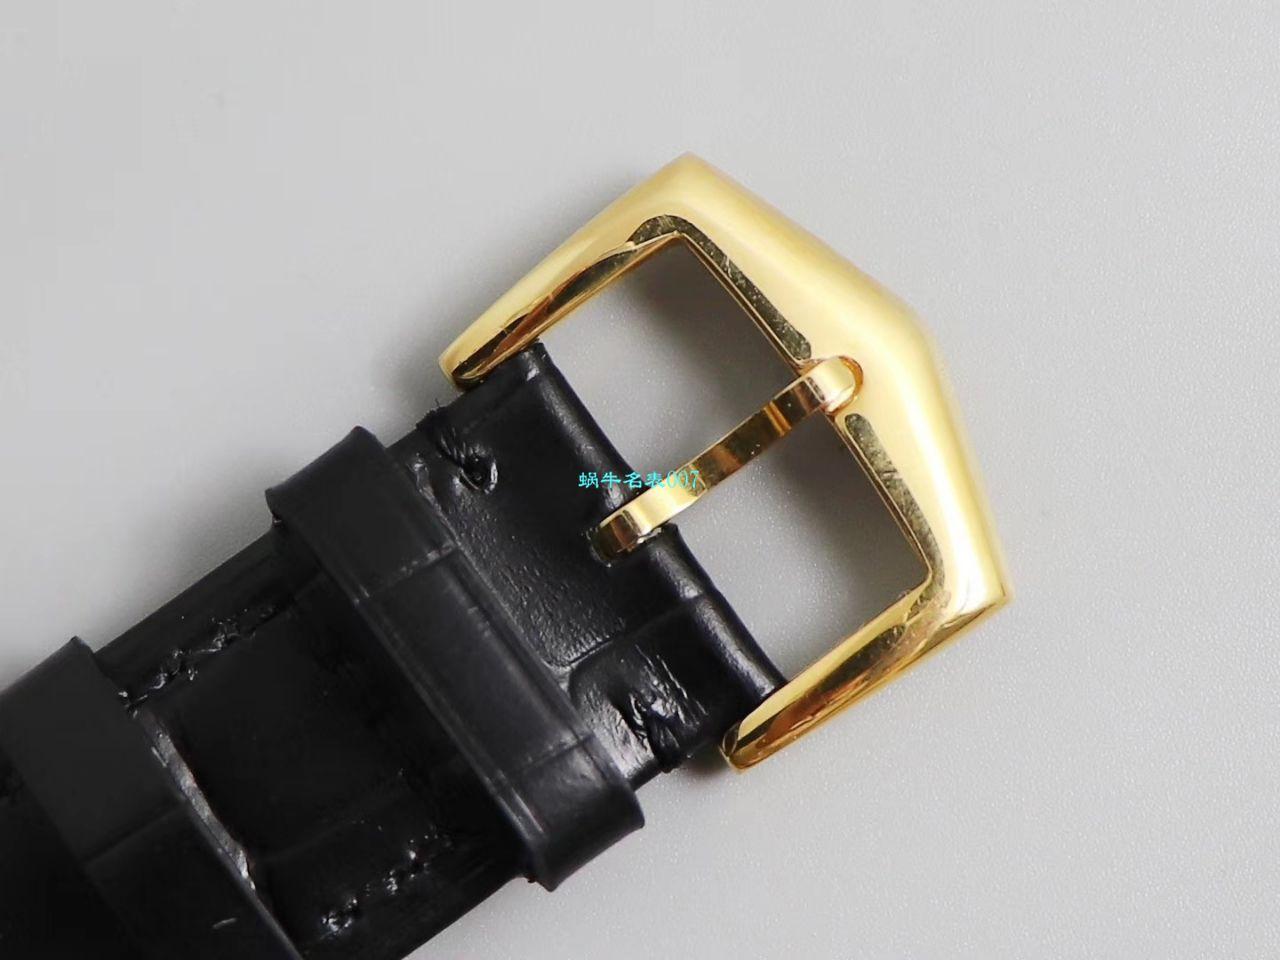 TW顶级复刻表百达翡丽古典表系列5120J-00,5120G-001腕表 / BD266